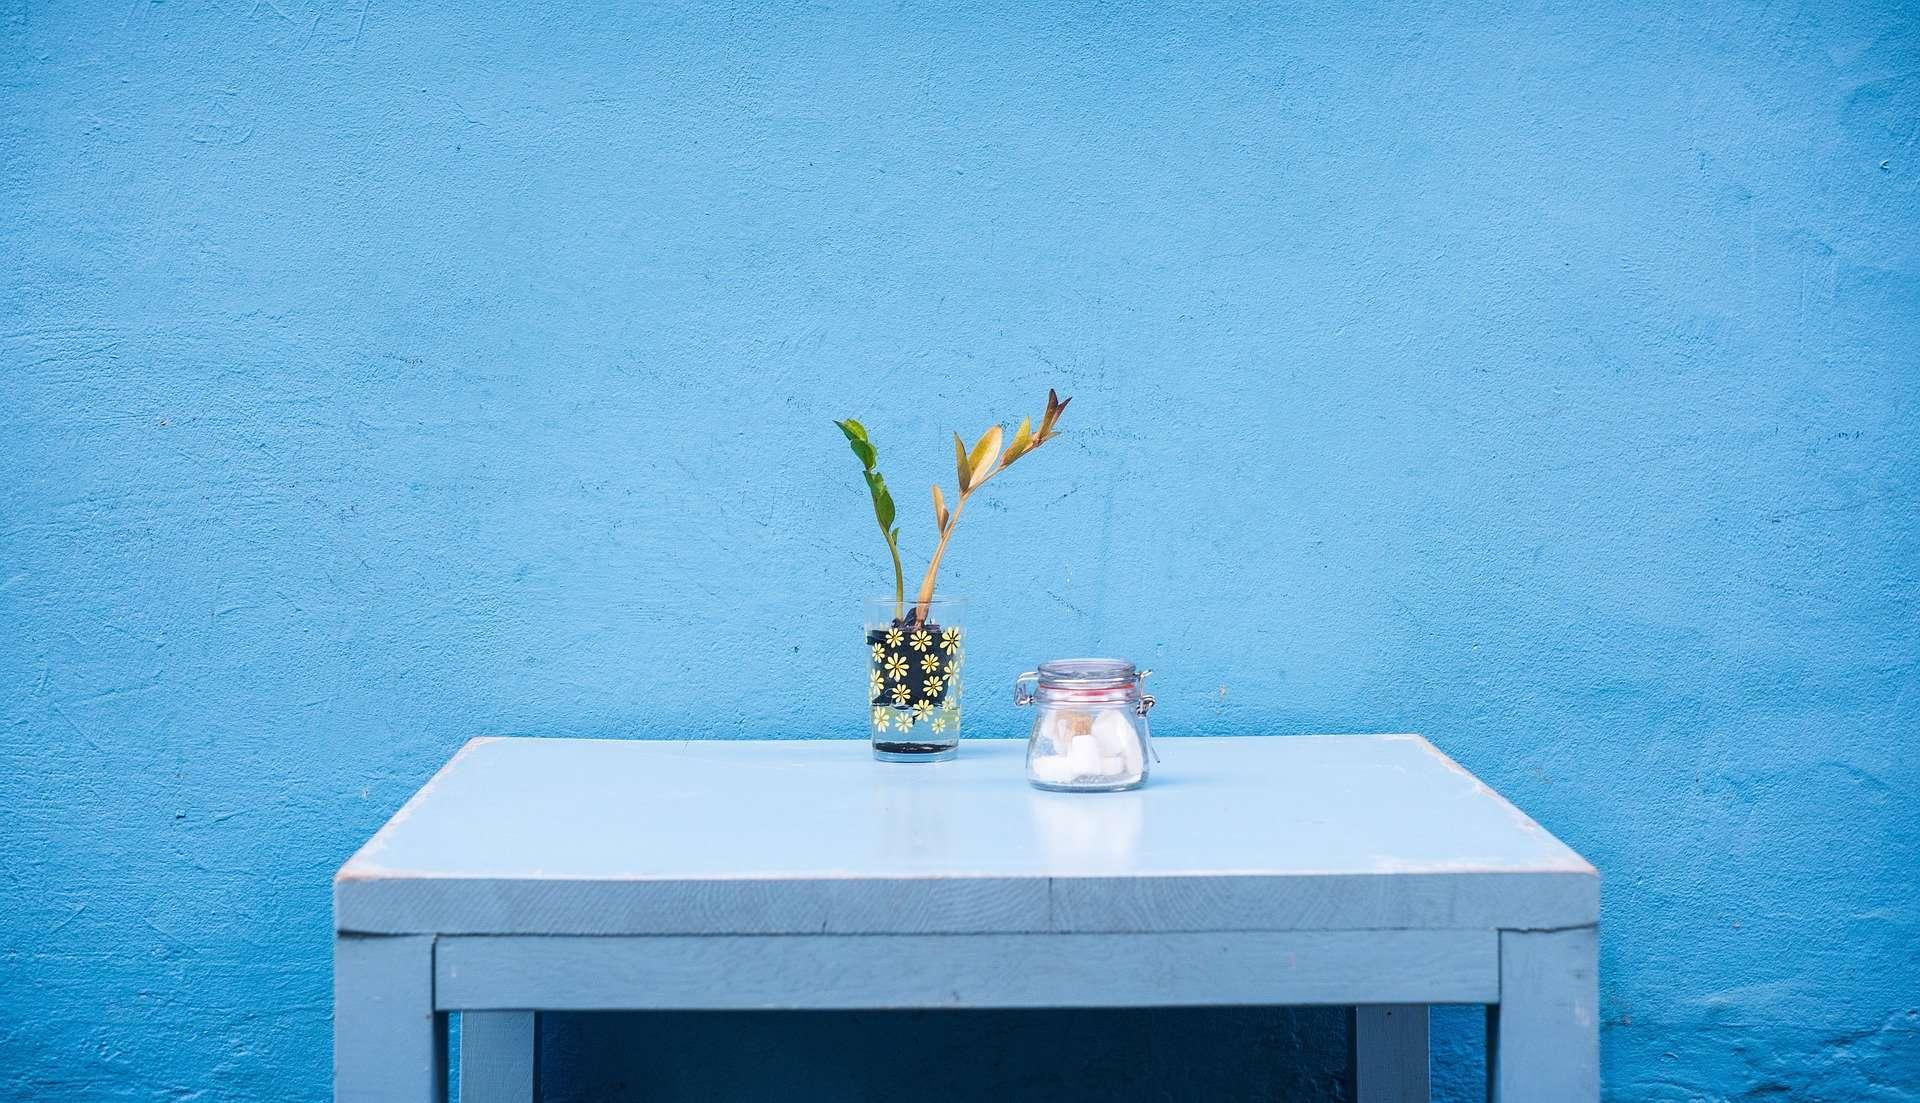 Home Decor Items For Interior Decorations